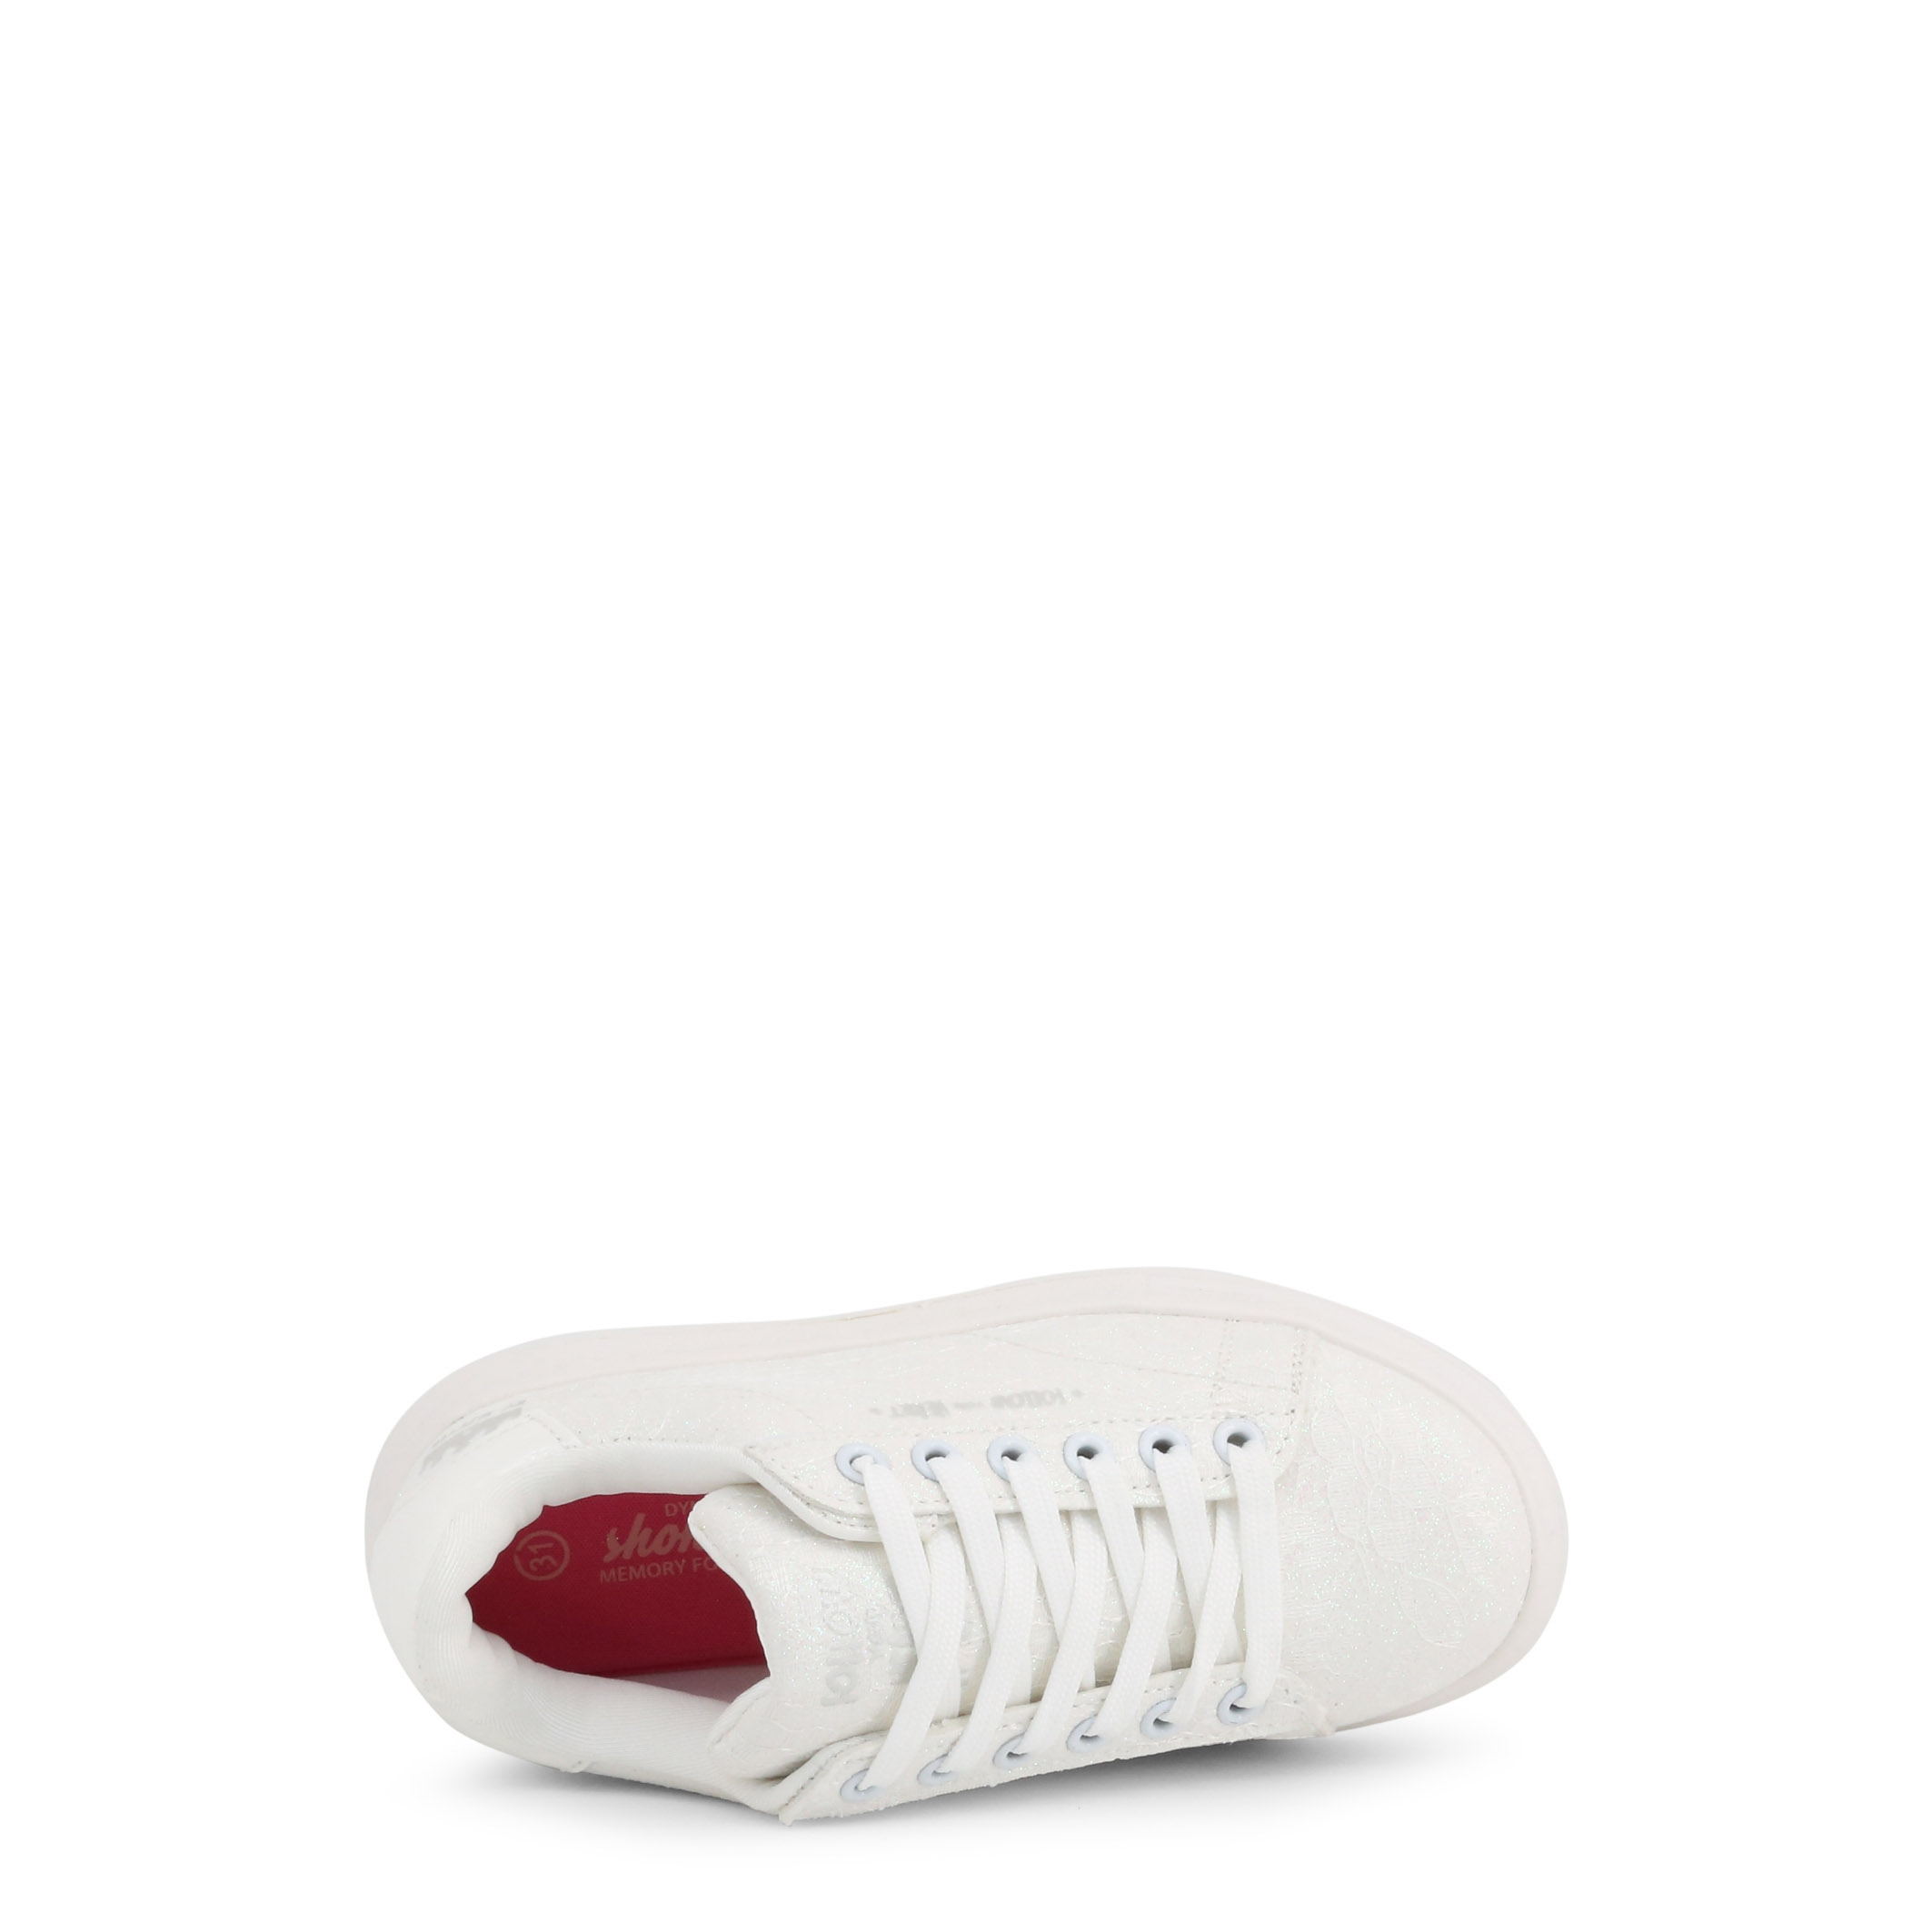 Pantofi sport Shone 1512-105 Alb